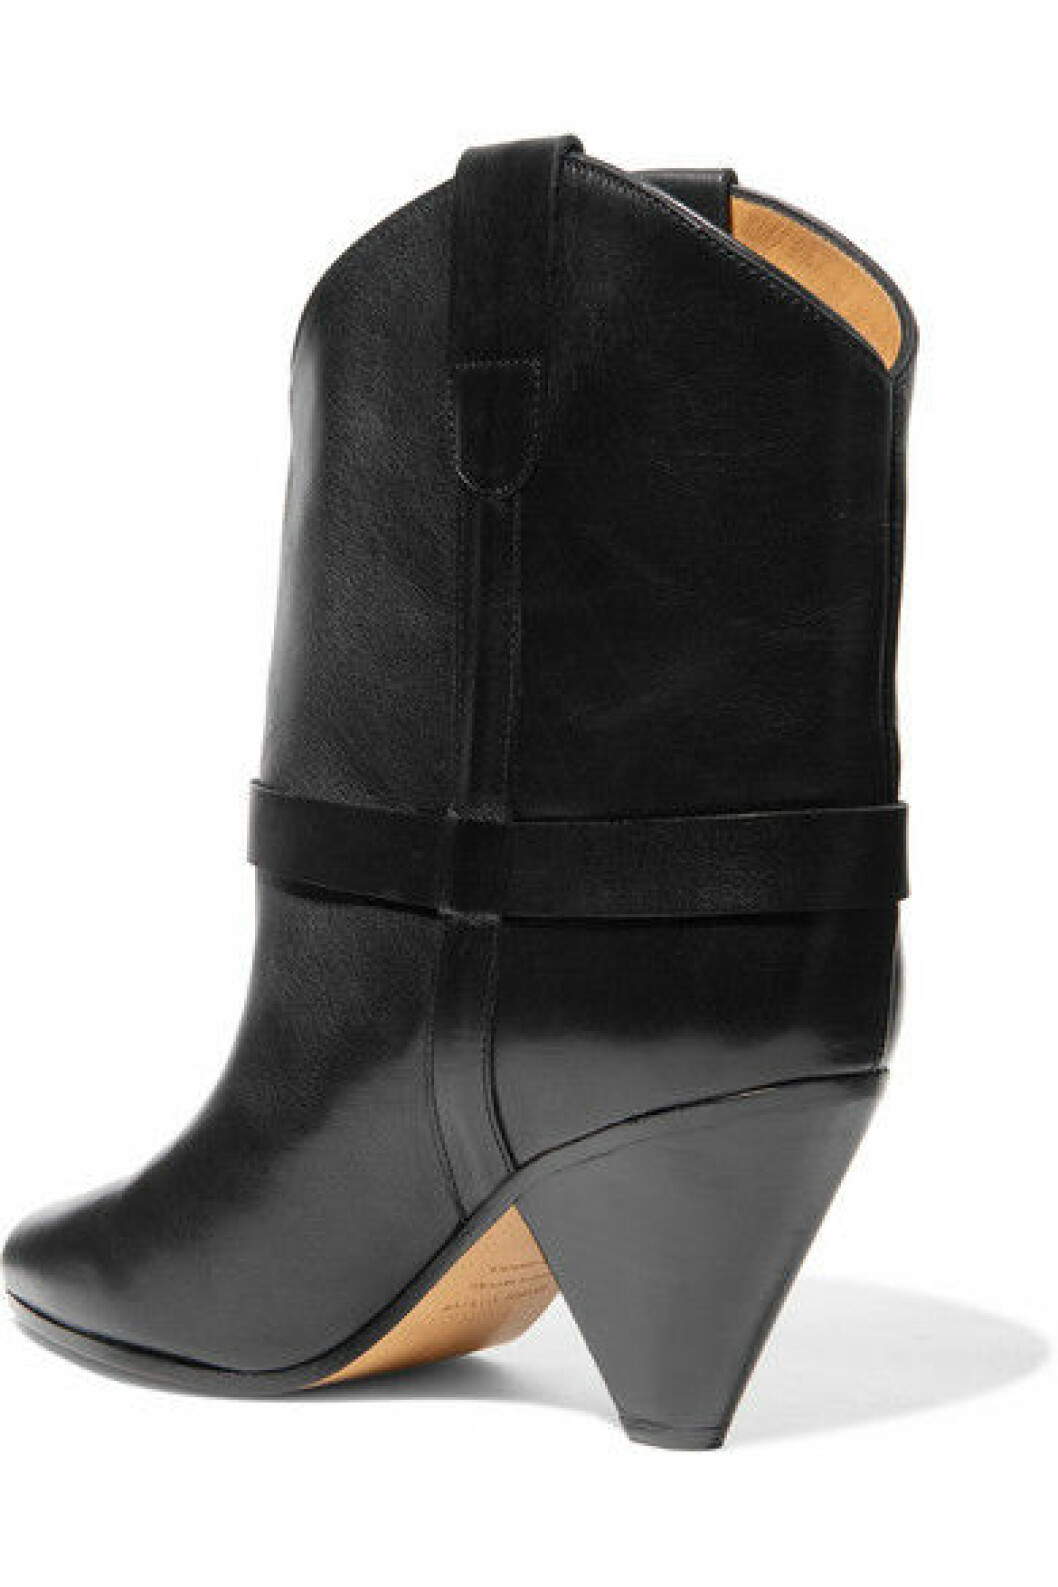 Boots från Isabel Marant